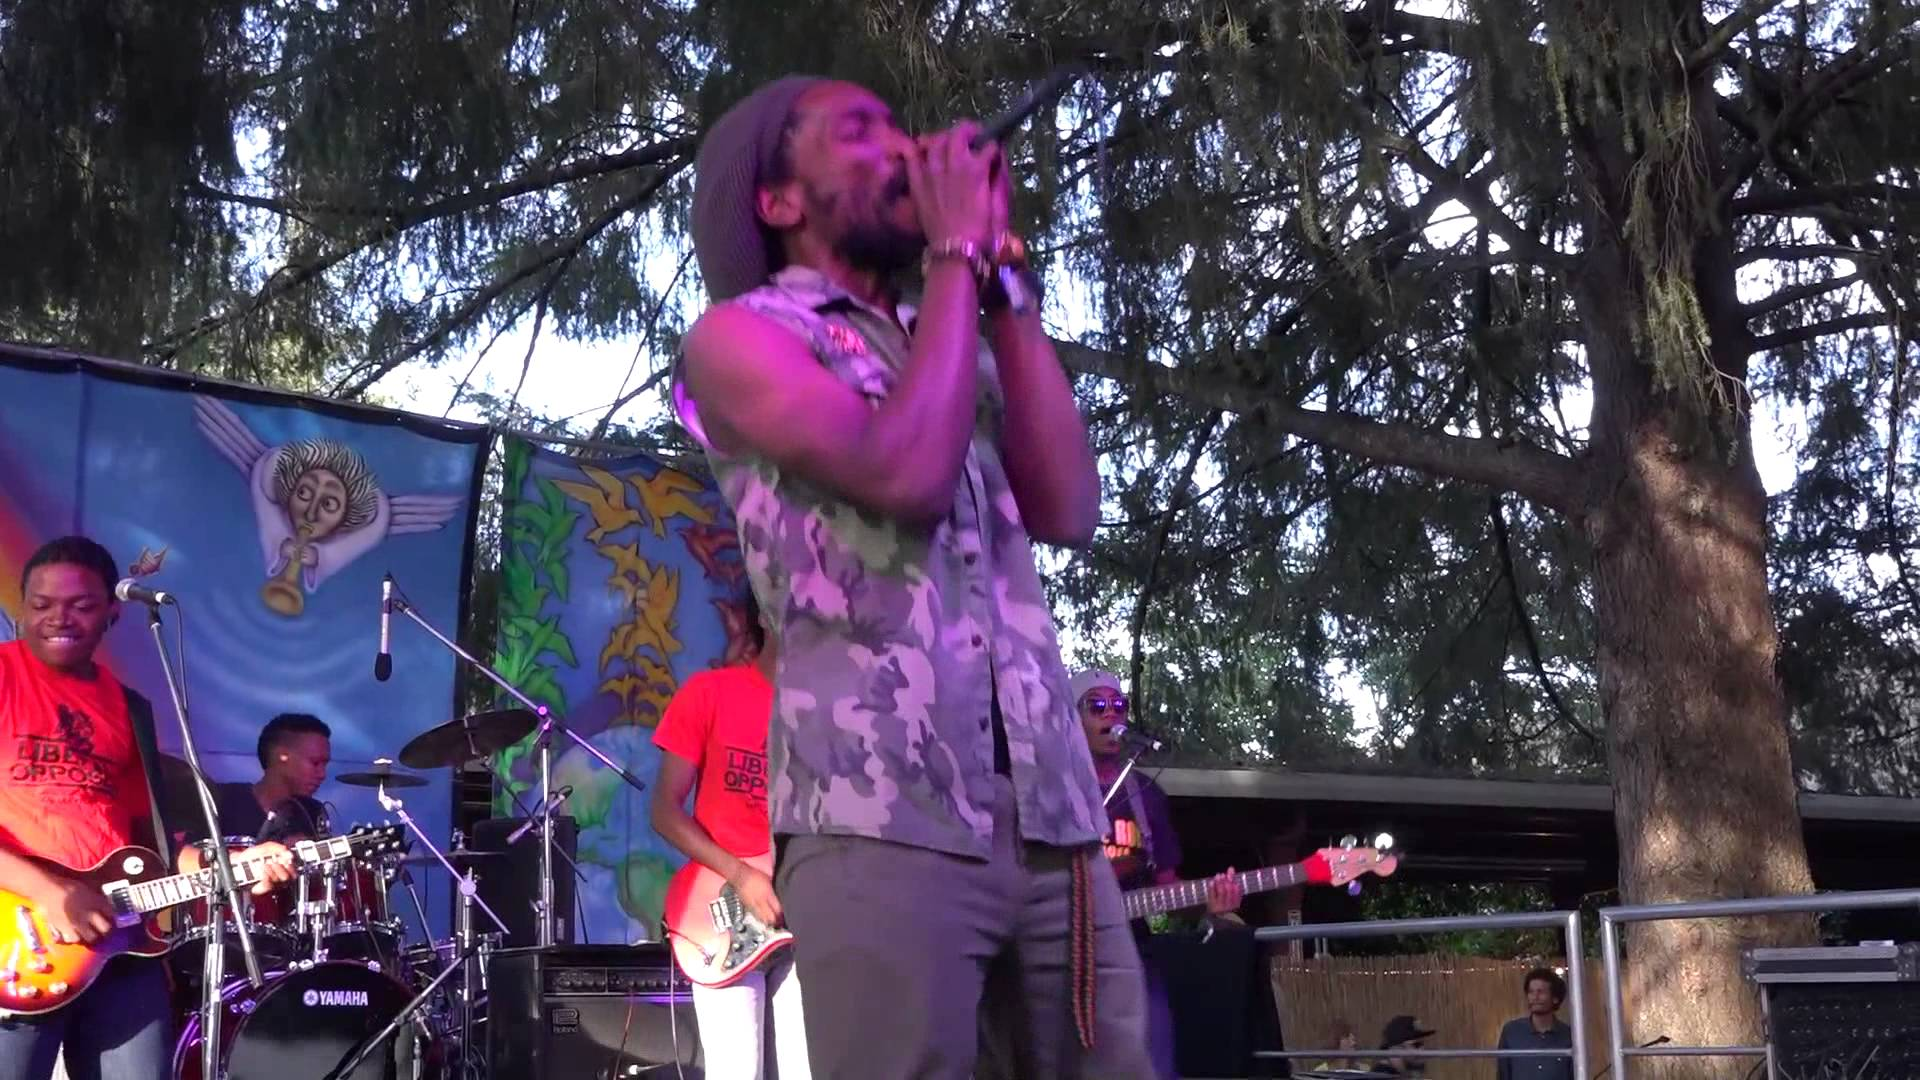 Kabaka Pyramid & The Bebble Rockers - Herb Defenda @ SNWMF 2014 [6/20/2014]